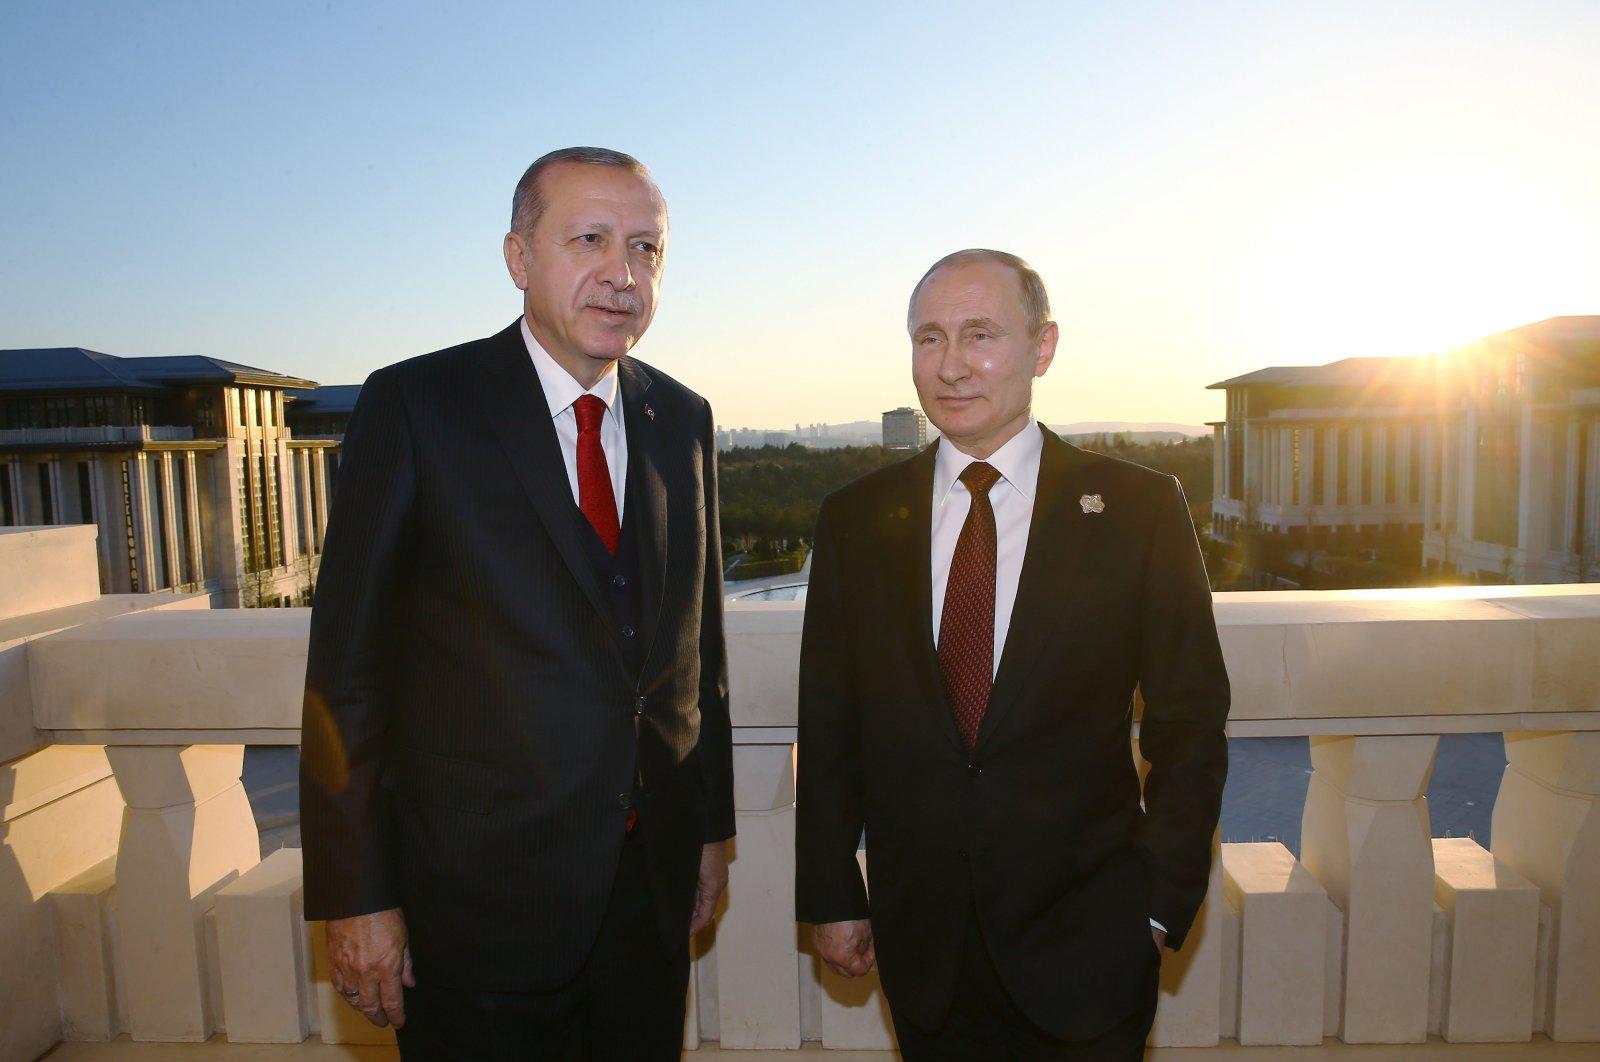 President Recep Tayyip Erdoğan and his Russian counterpart Vladimir Putin in Ankara, Turkey, April 3, 2018.